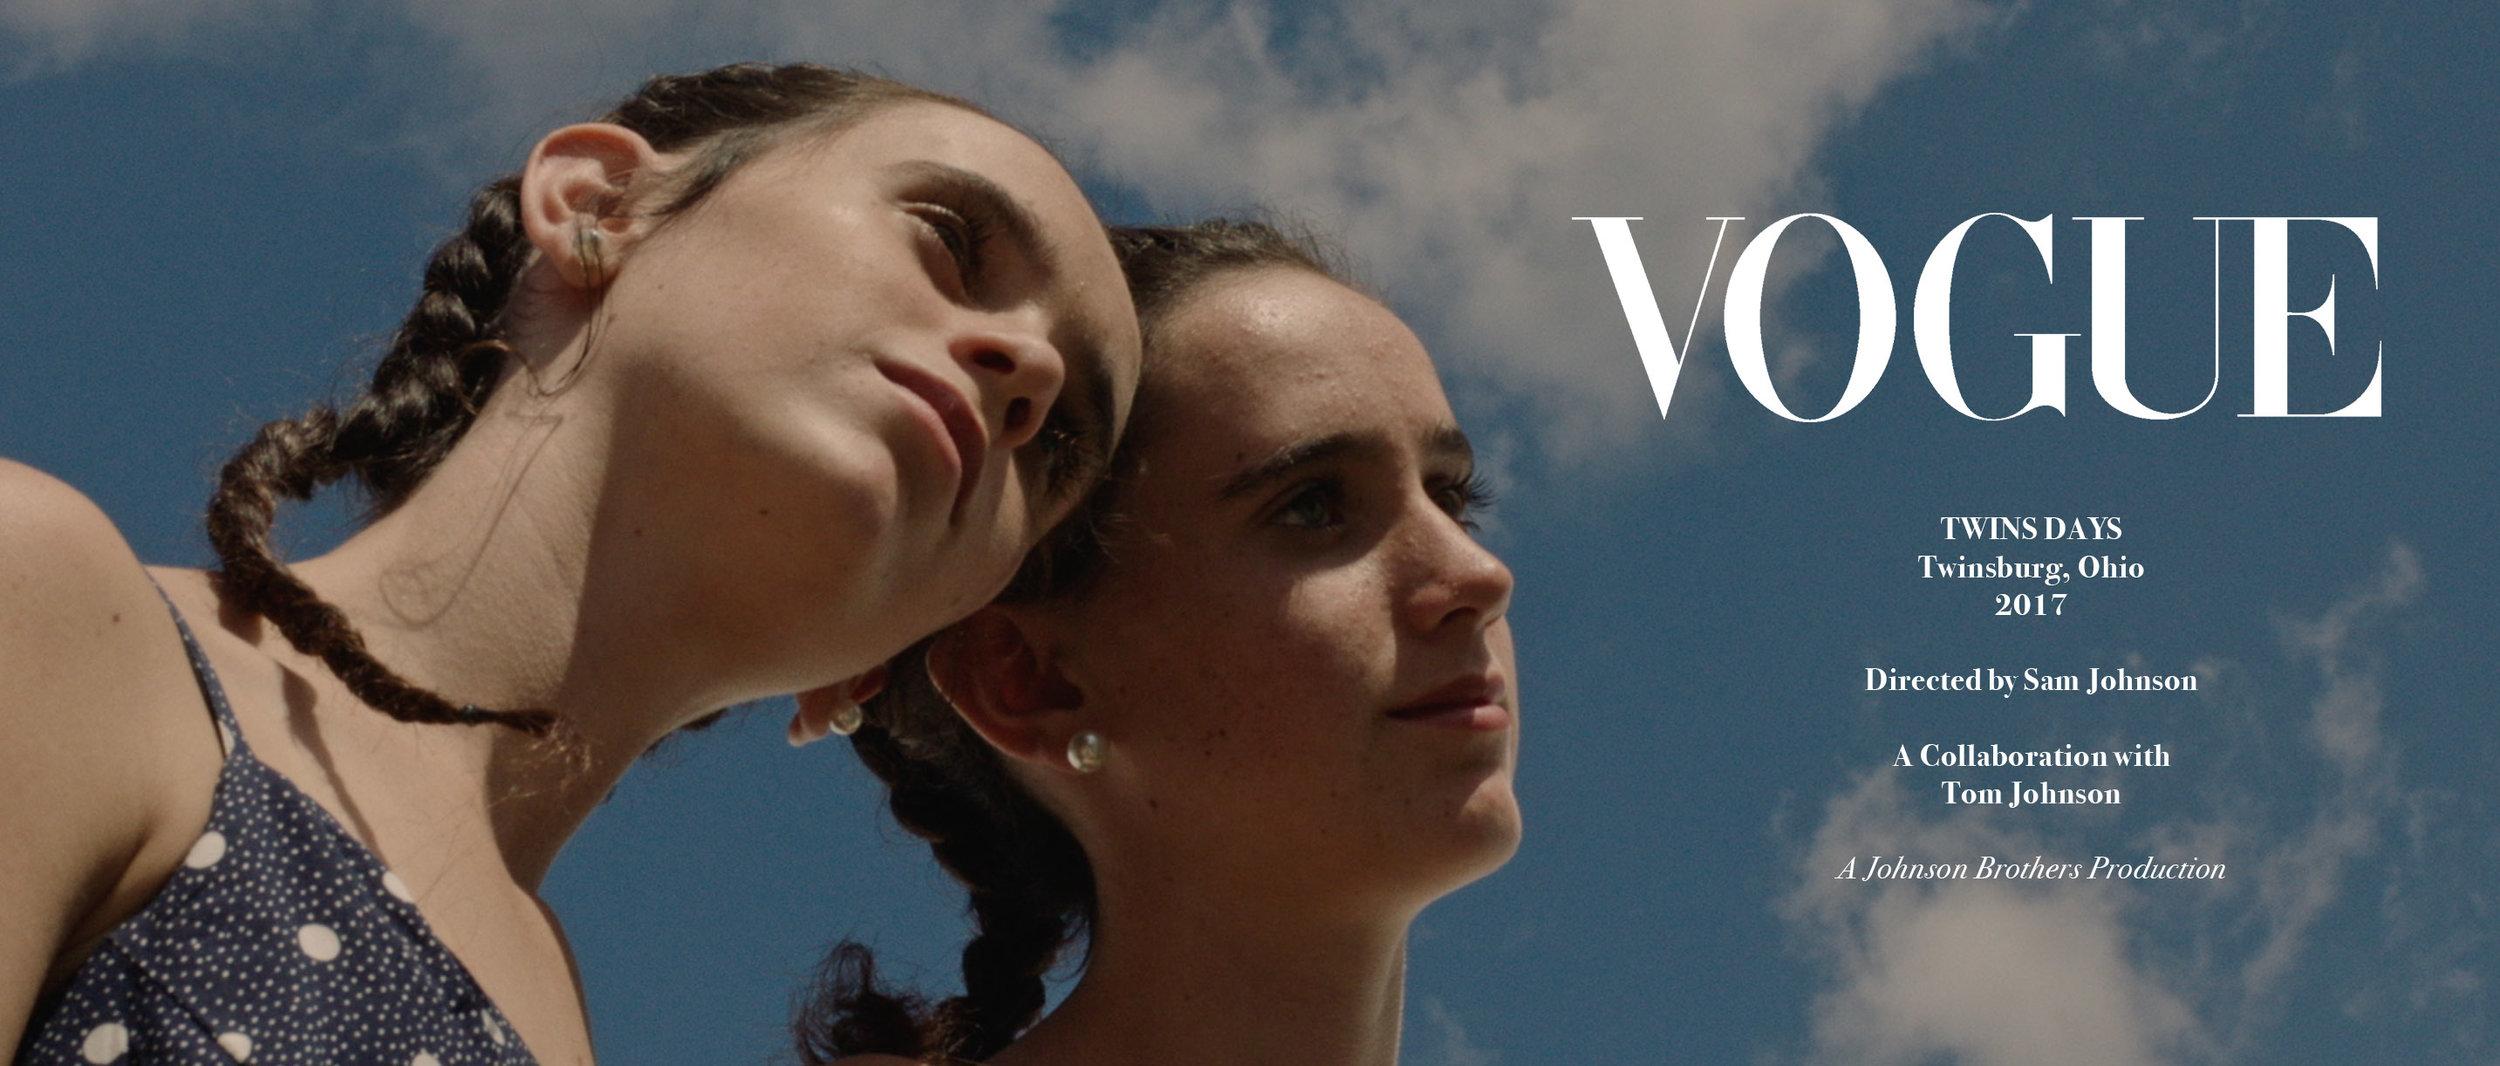 Vogue_Twins_2.35.jpg